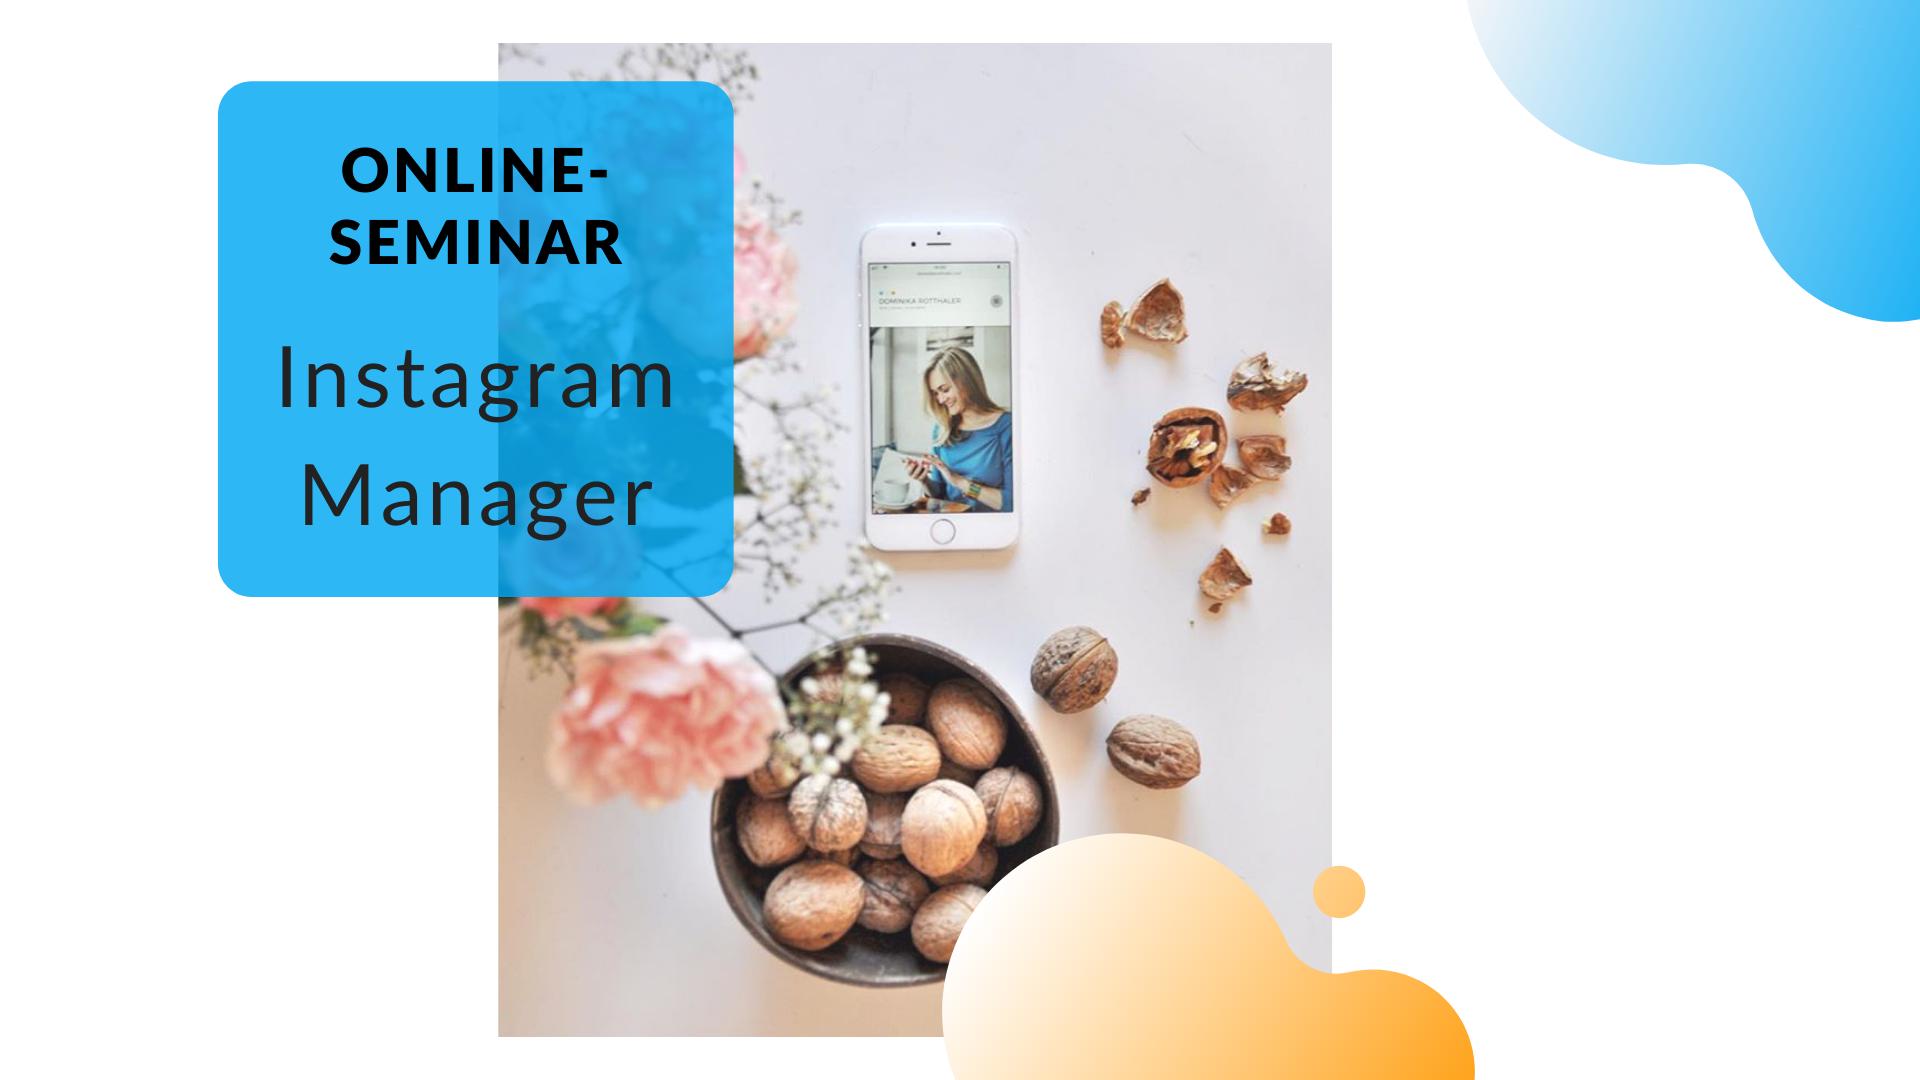 Online-Seminar Instagram Manager